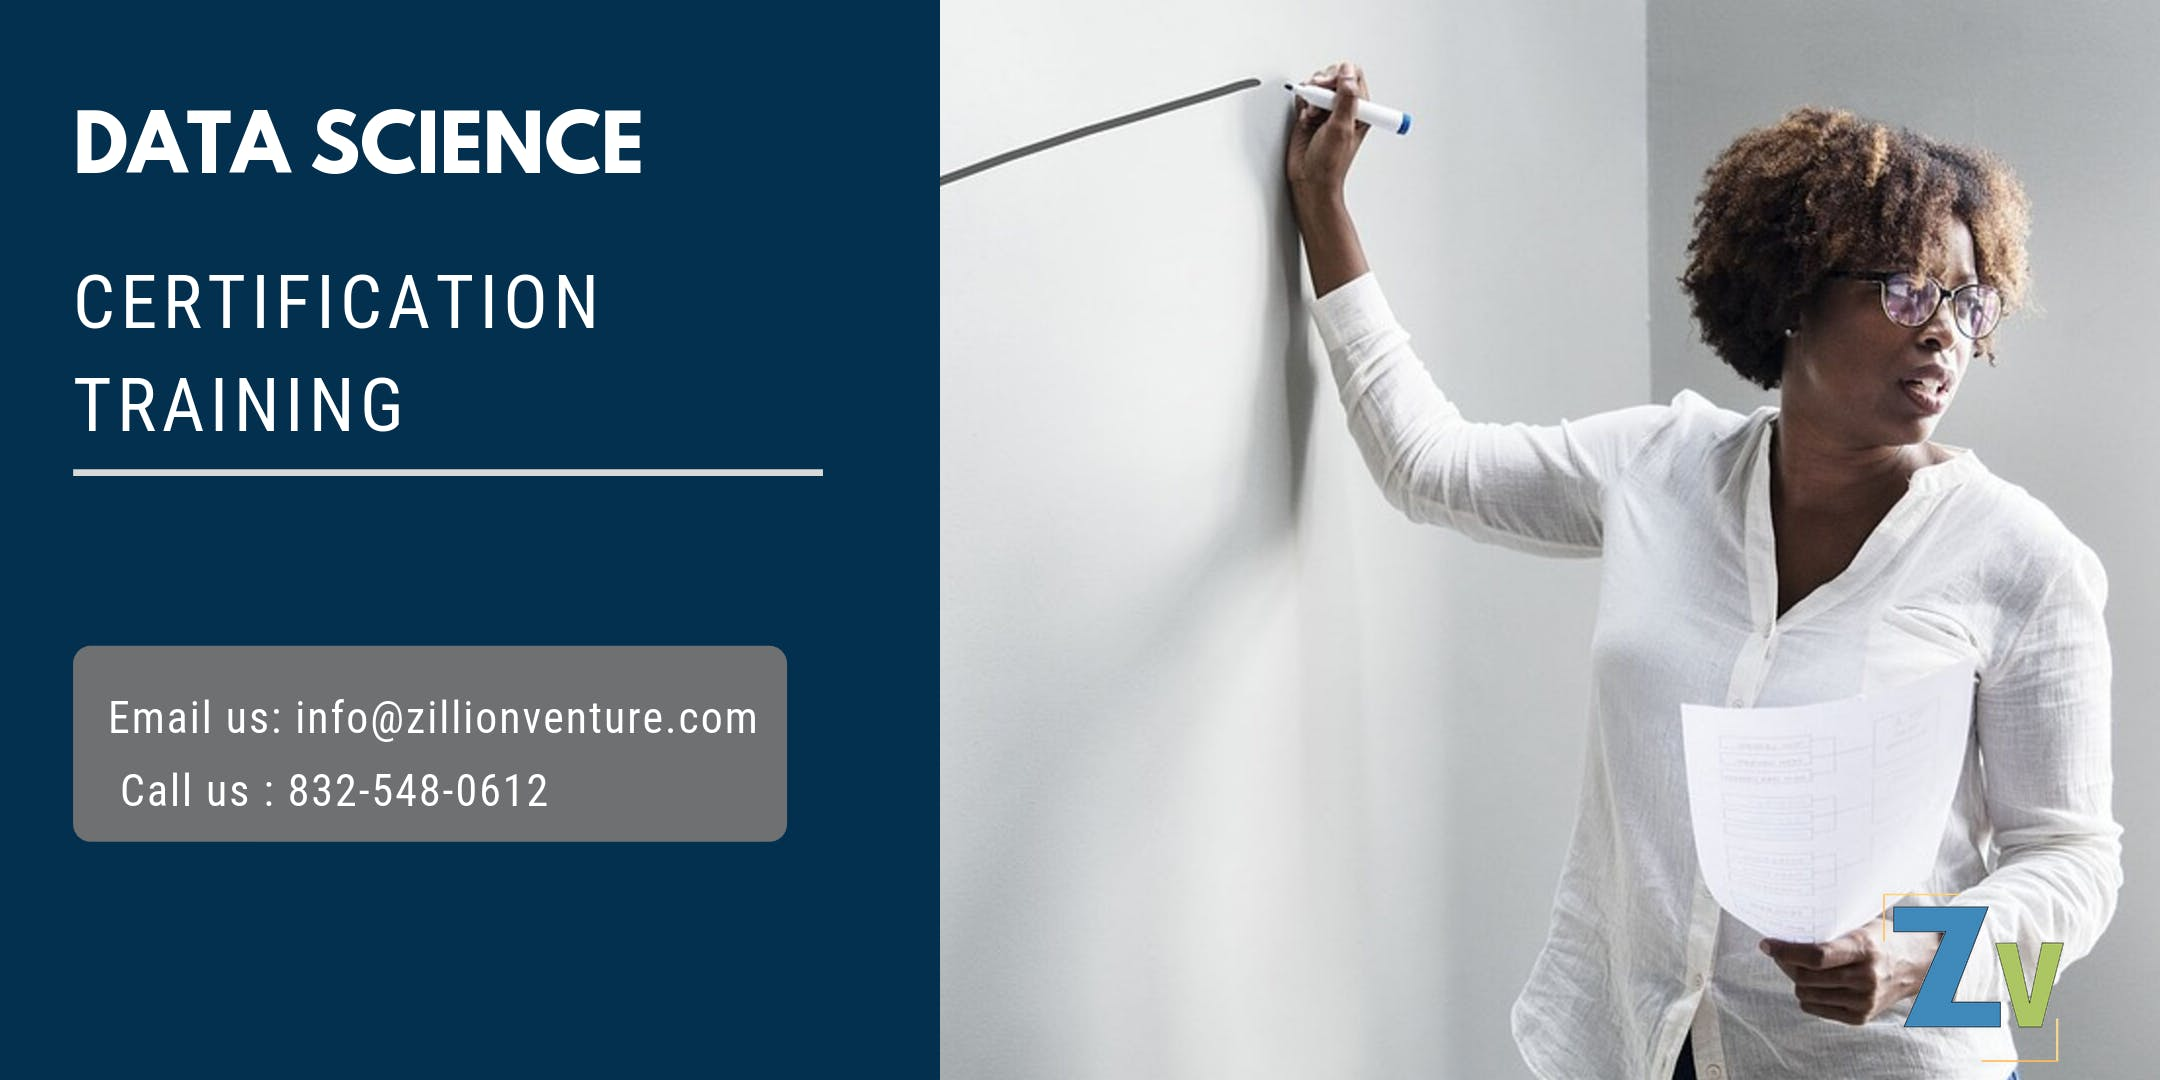 Data Science Online Training in Penticton, BC